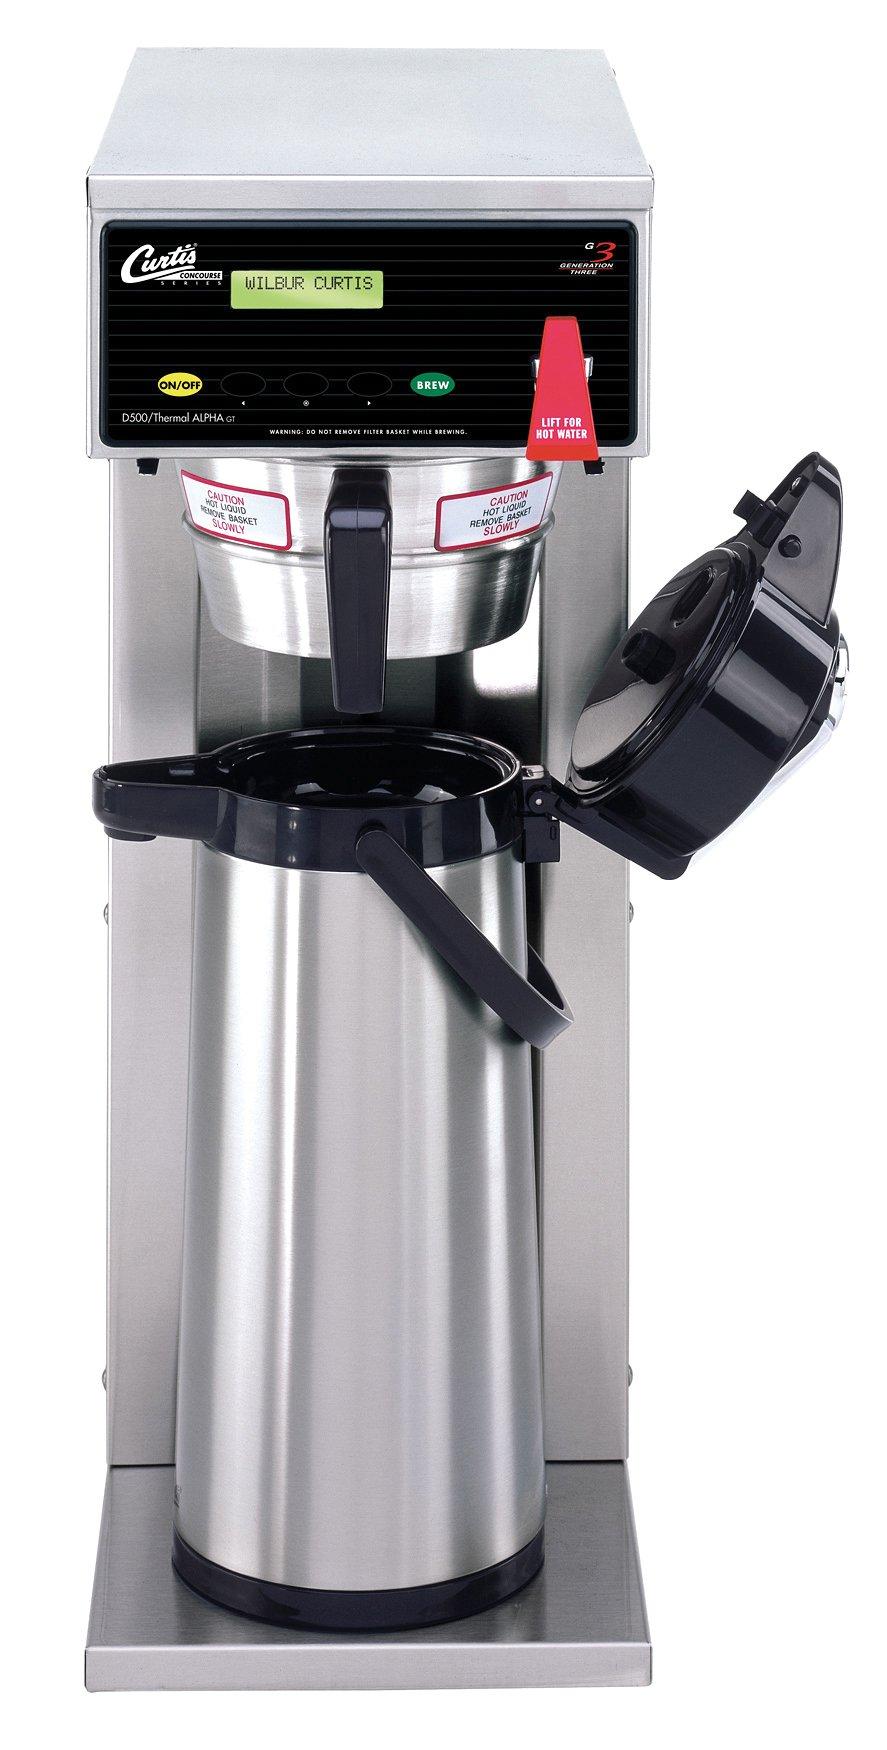 Wilbur Curtis G3 Airpot Brewer 2.2L To 2.5 L Single/Standard Airpot Coffee Brewer, Dual Voltage - Commercial Airpot Coffee Brewer  - D500GT63A000 (Each)